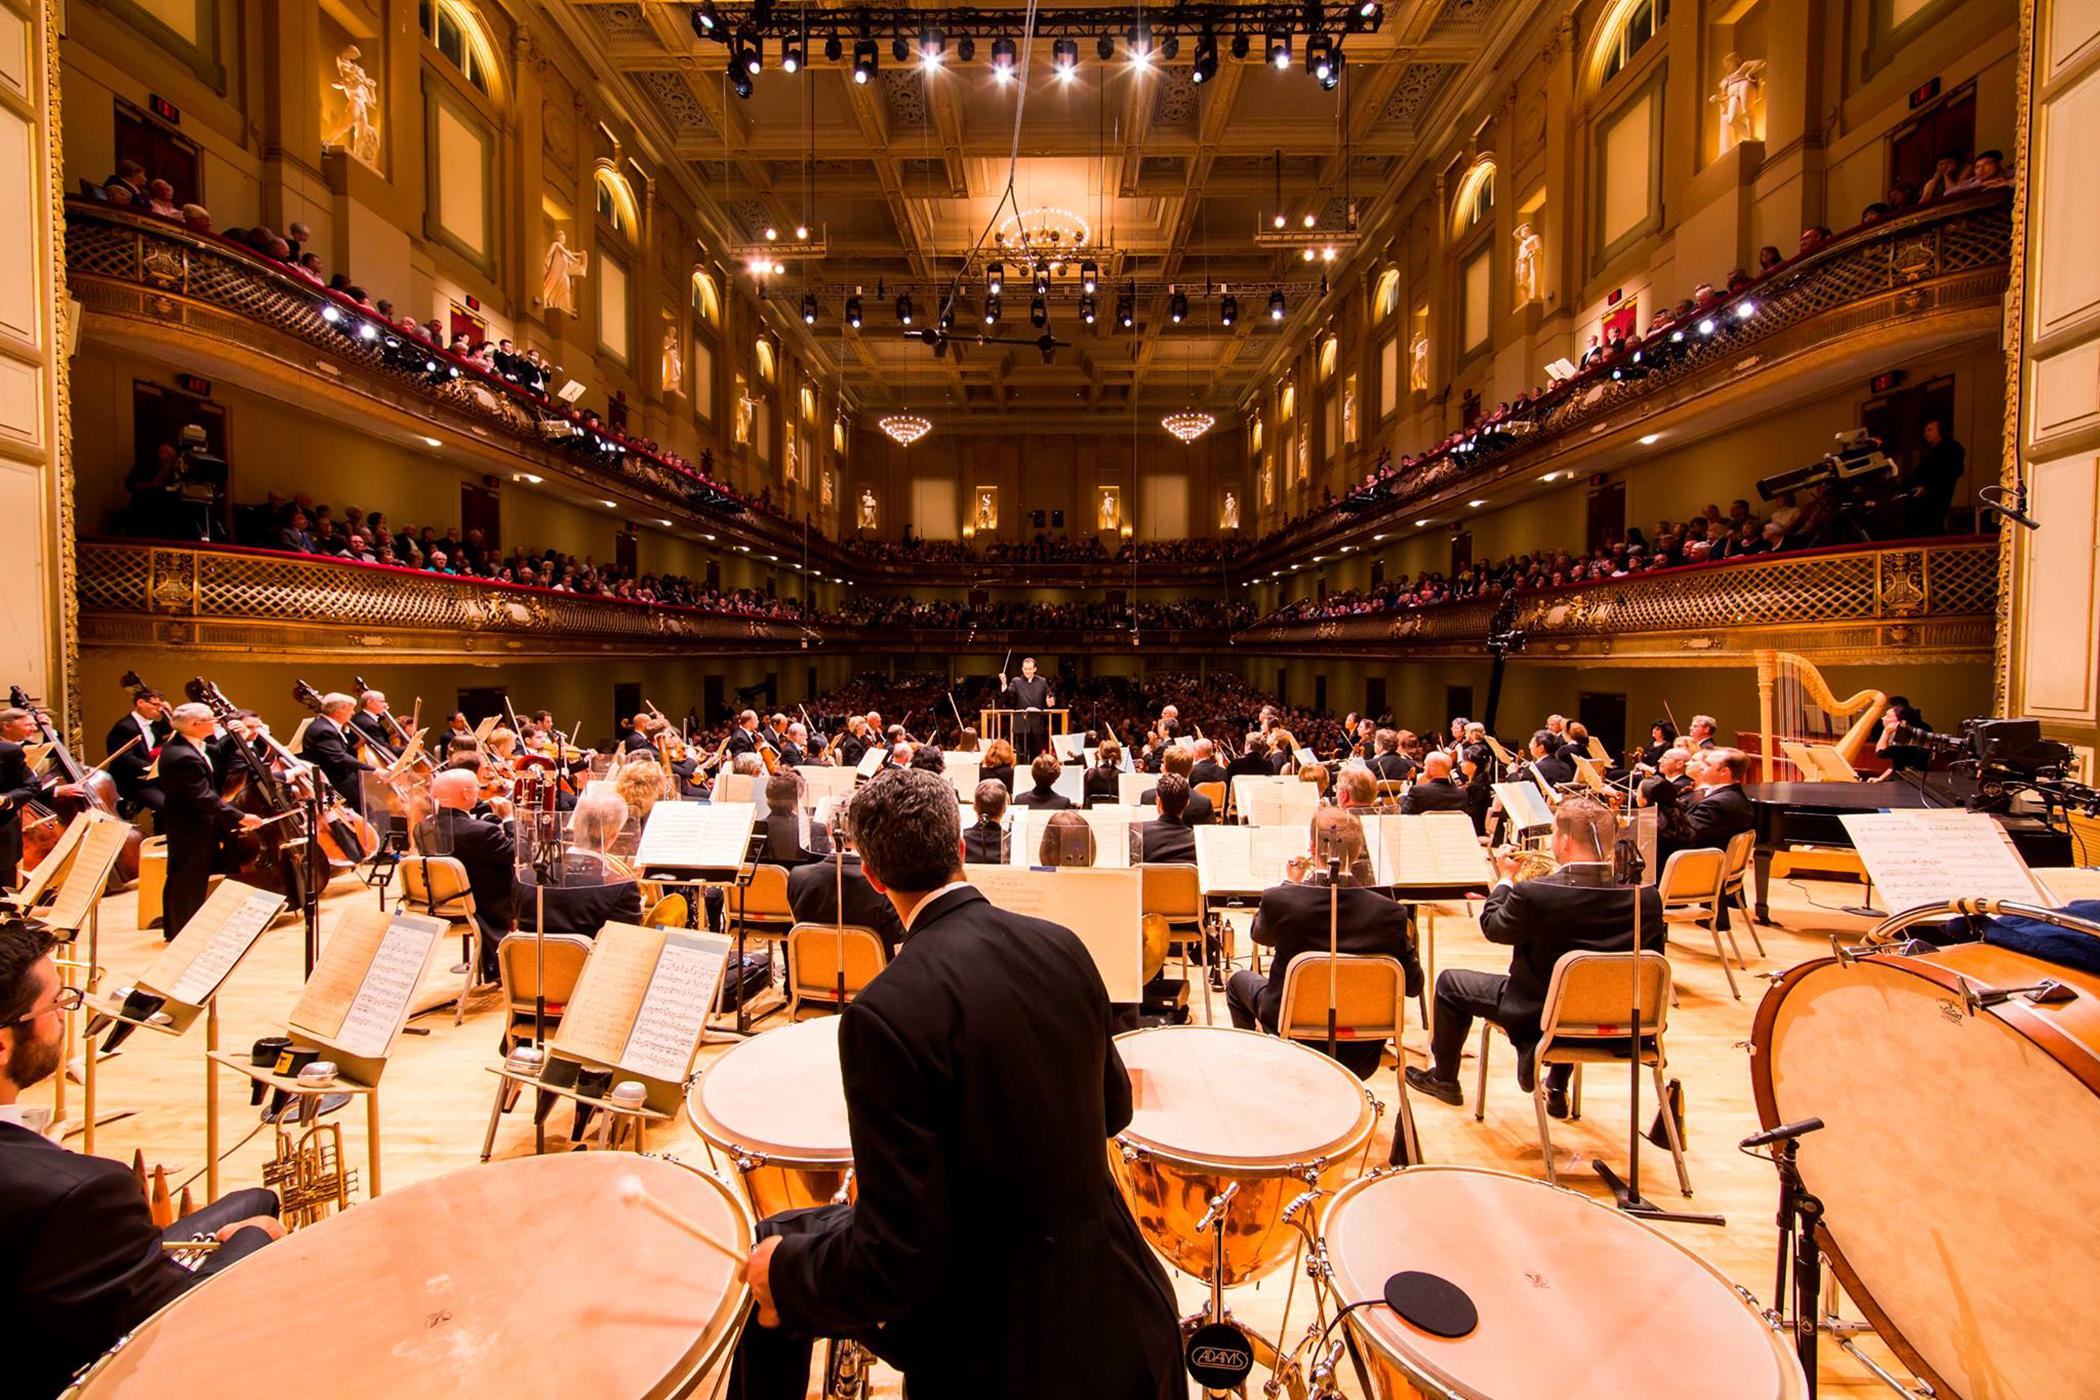 Courtesy of the Boston Symphony Orchestra